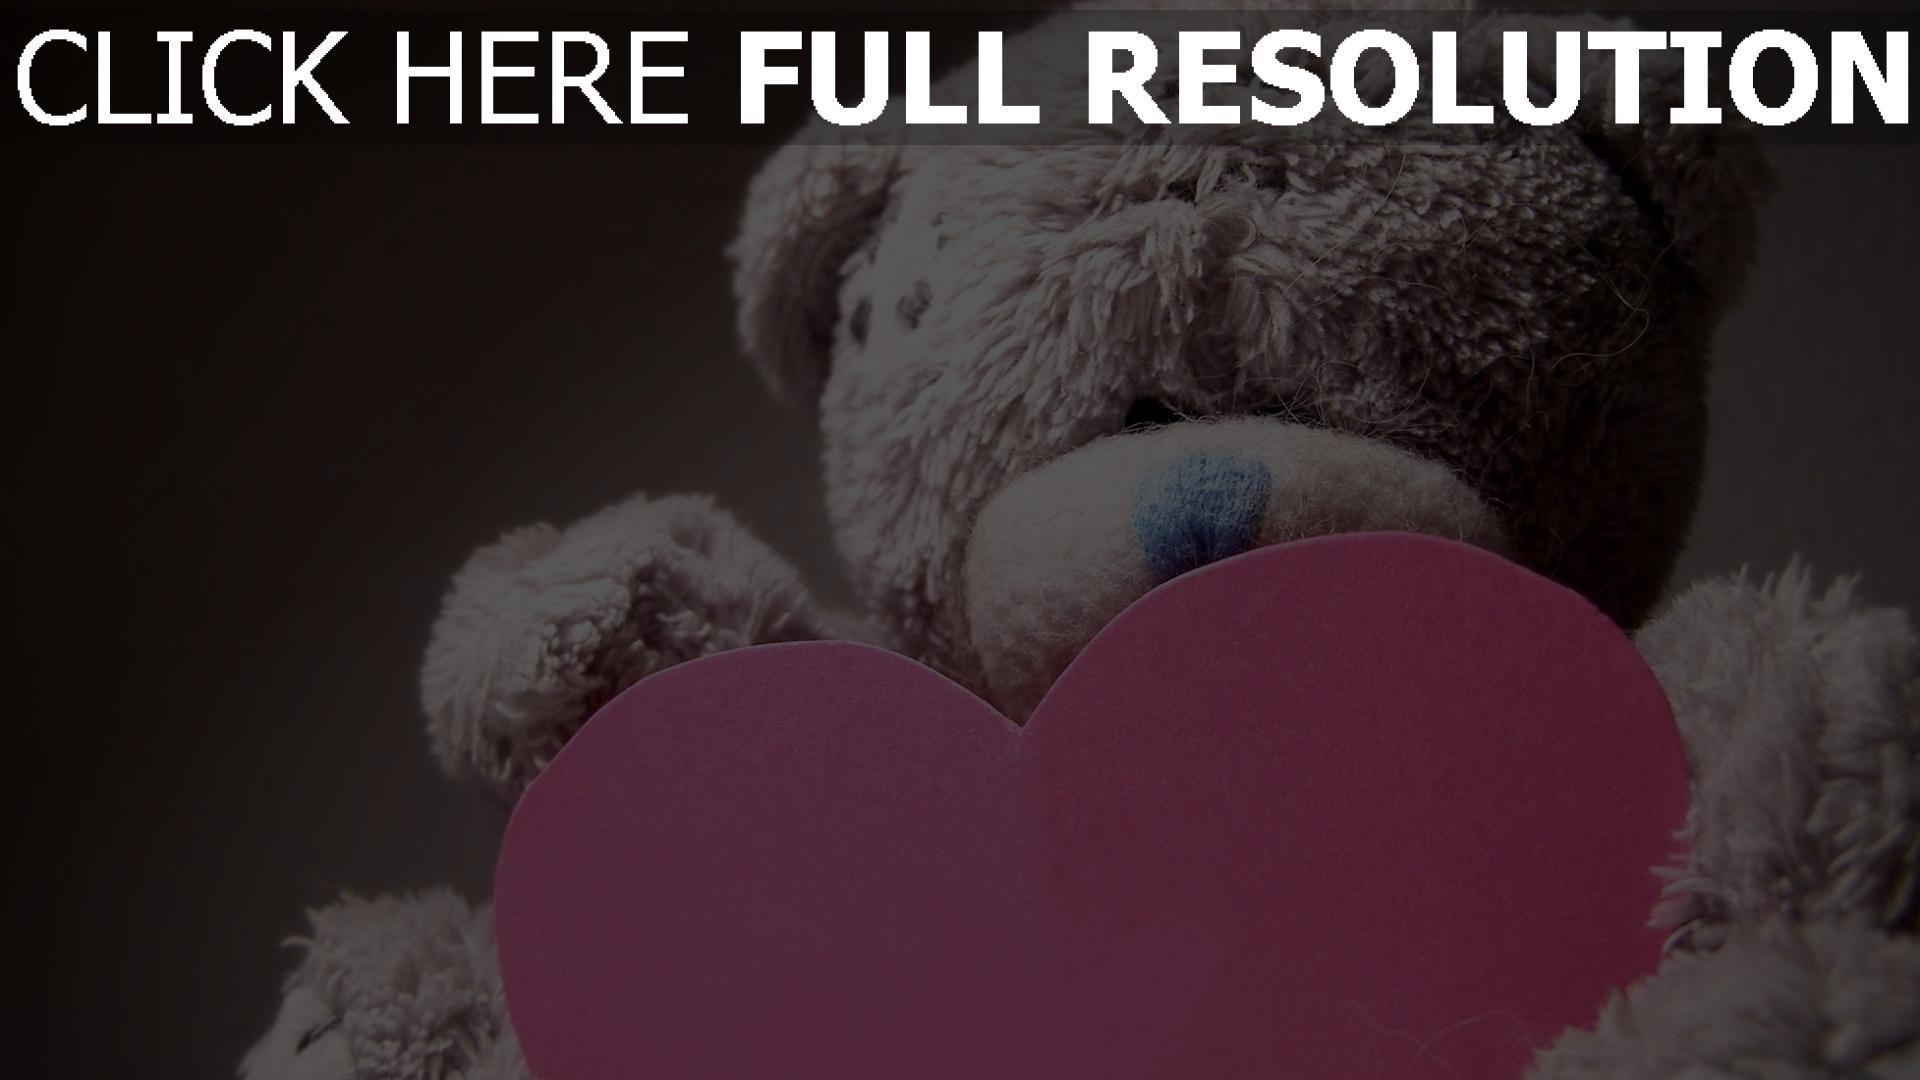 HD Hintergrundbilder valentinstag herz teddybär romantik, desktop ...